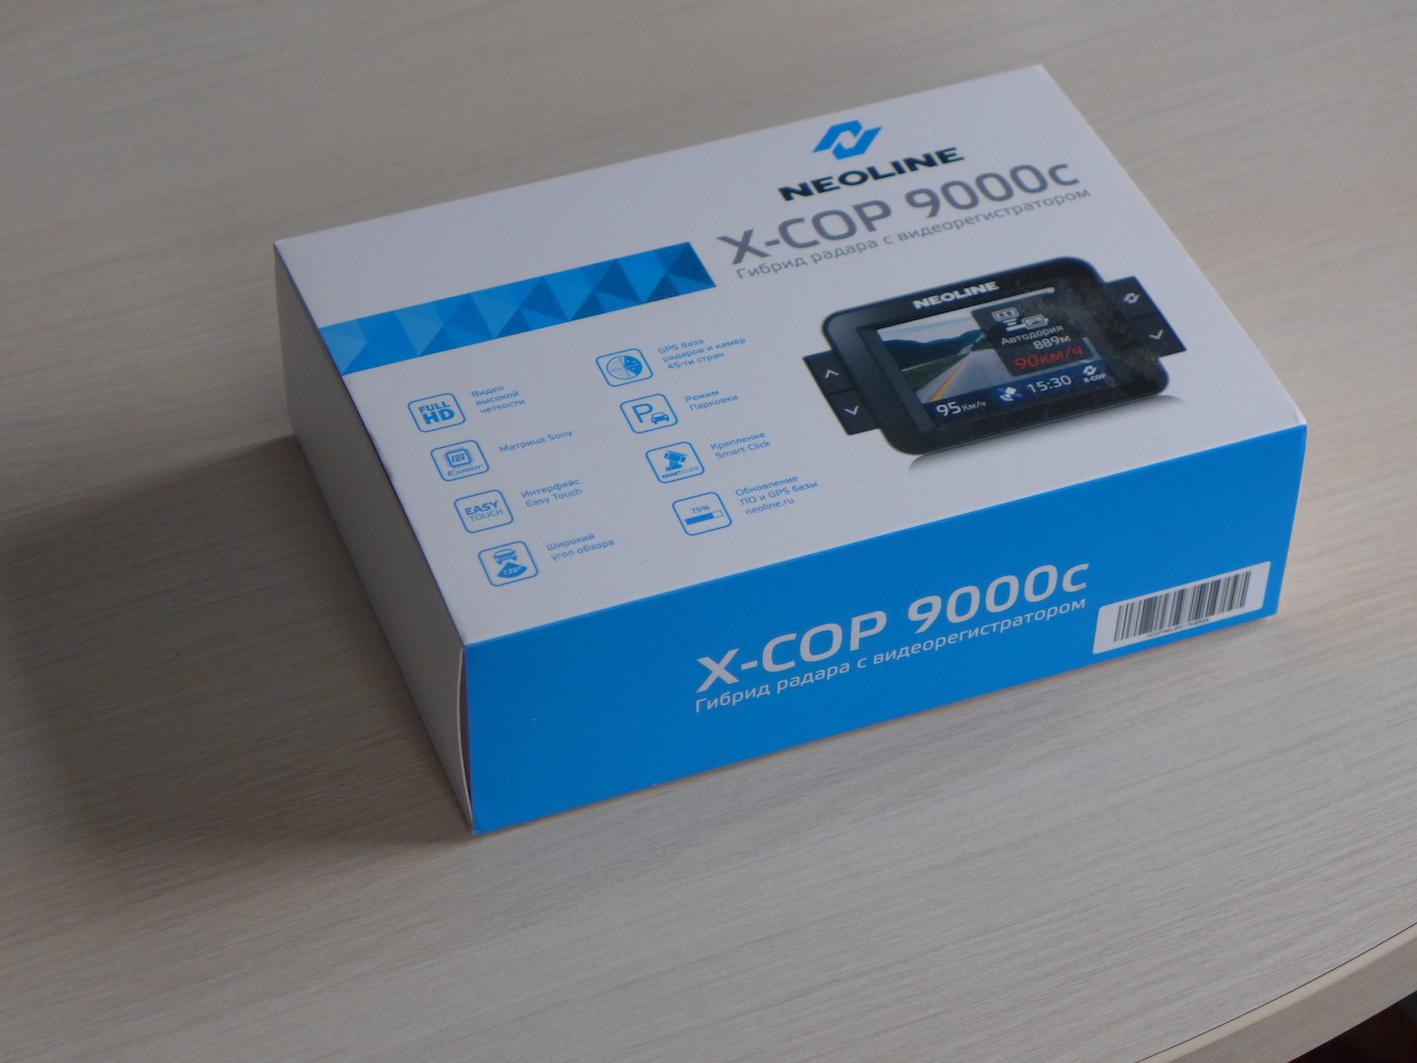 NEONLINE X-COP 9000c гибрид радар детектора и видеорегистратора